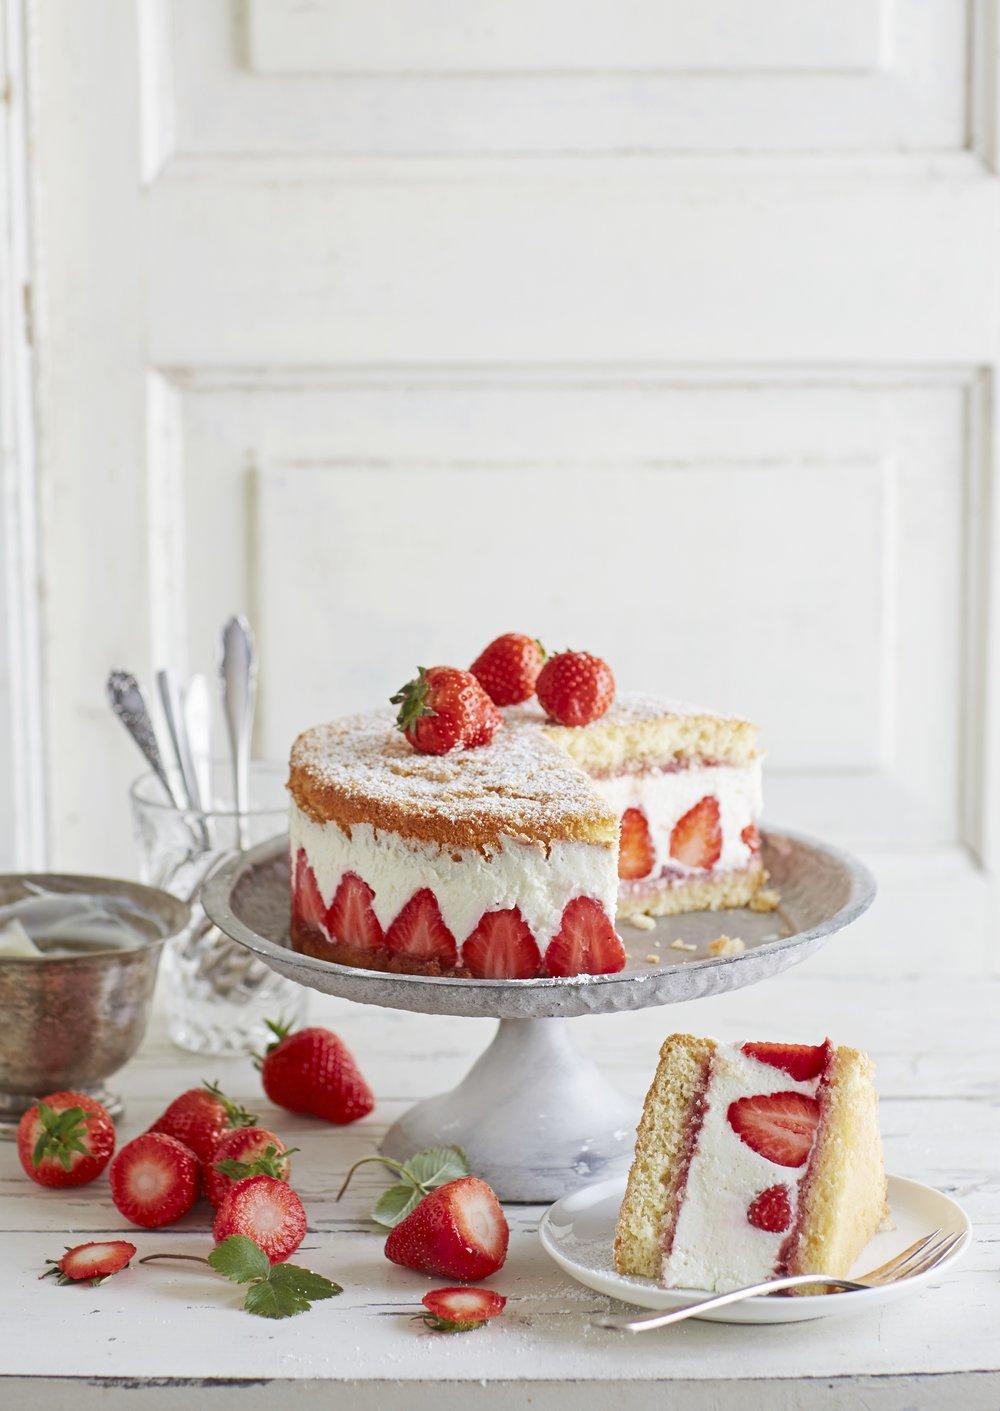 Strawberriesandcreamcake.jpg